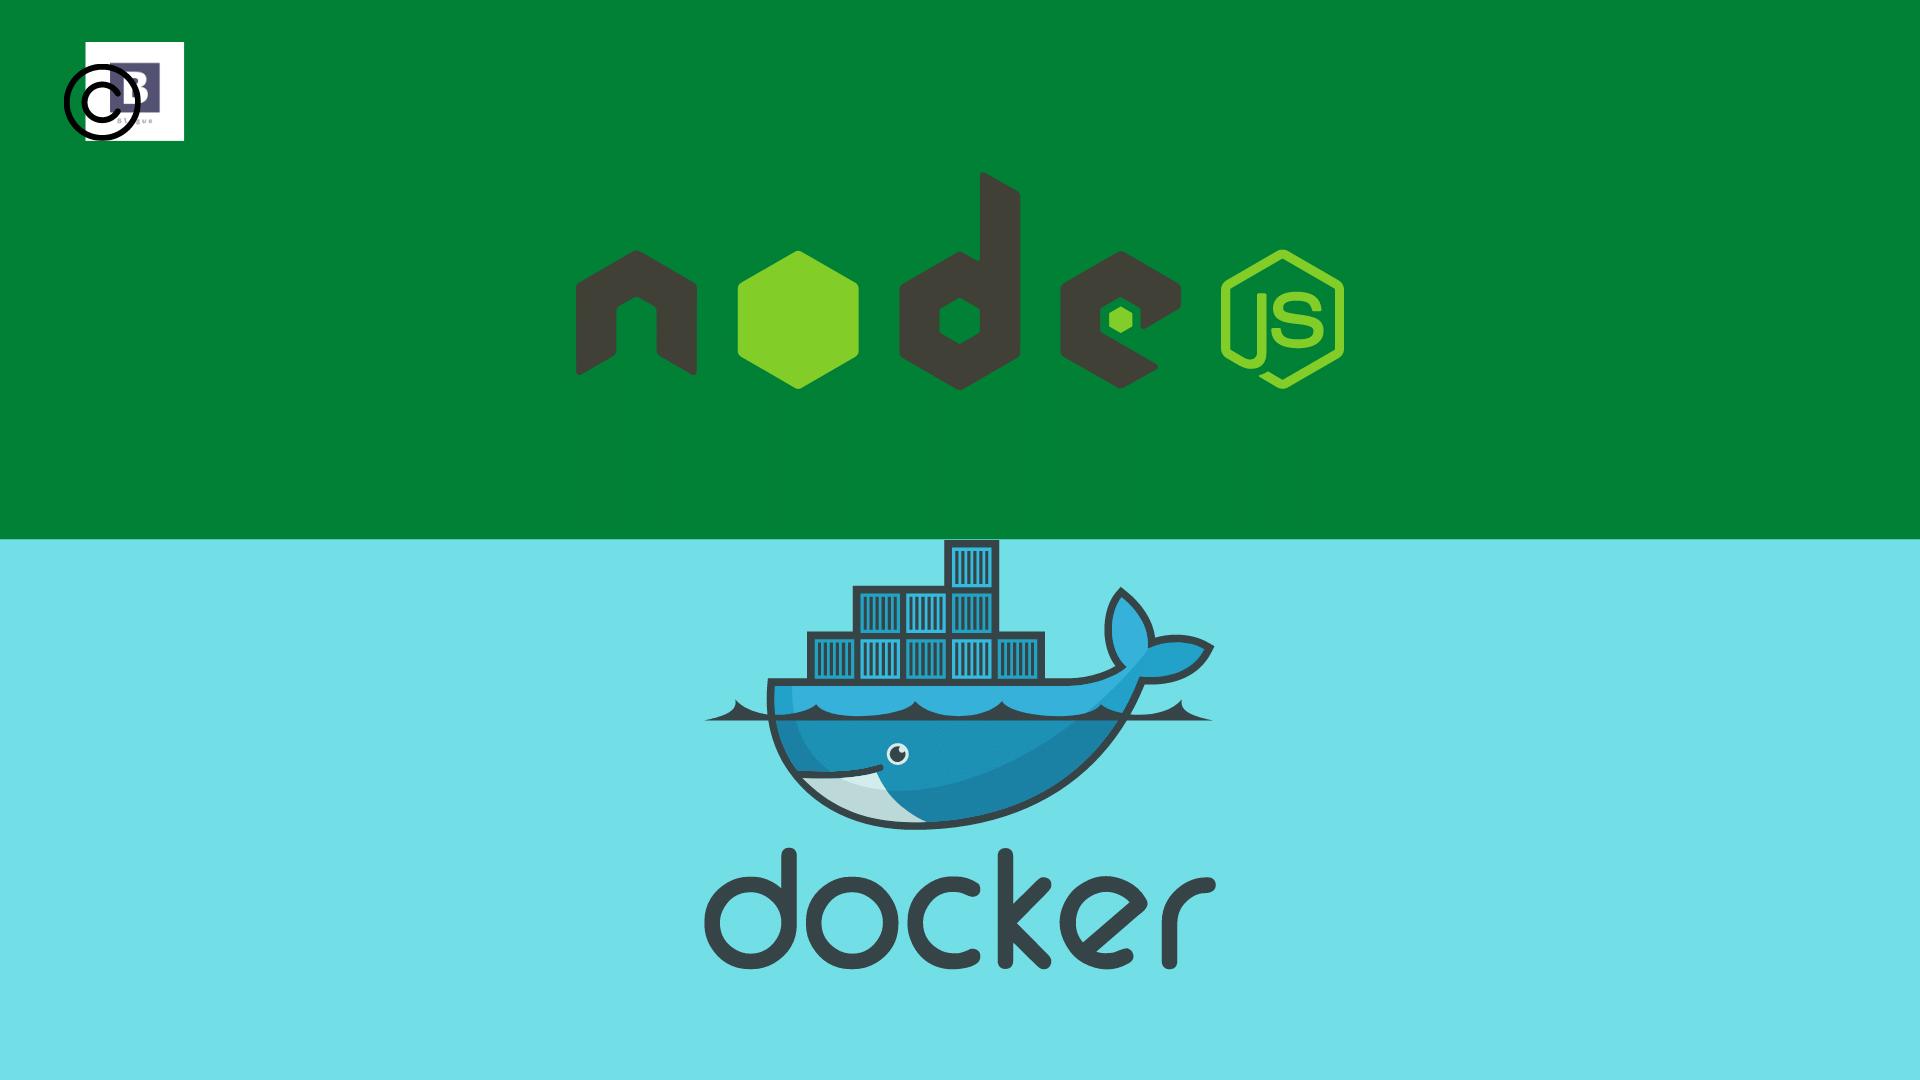 Dockerizing a Nodejs web app